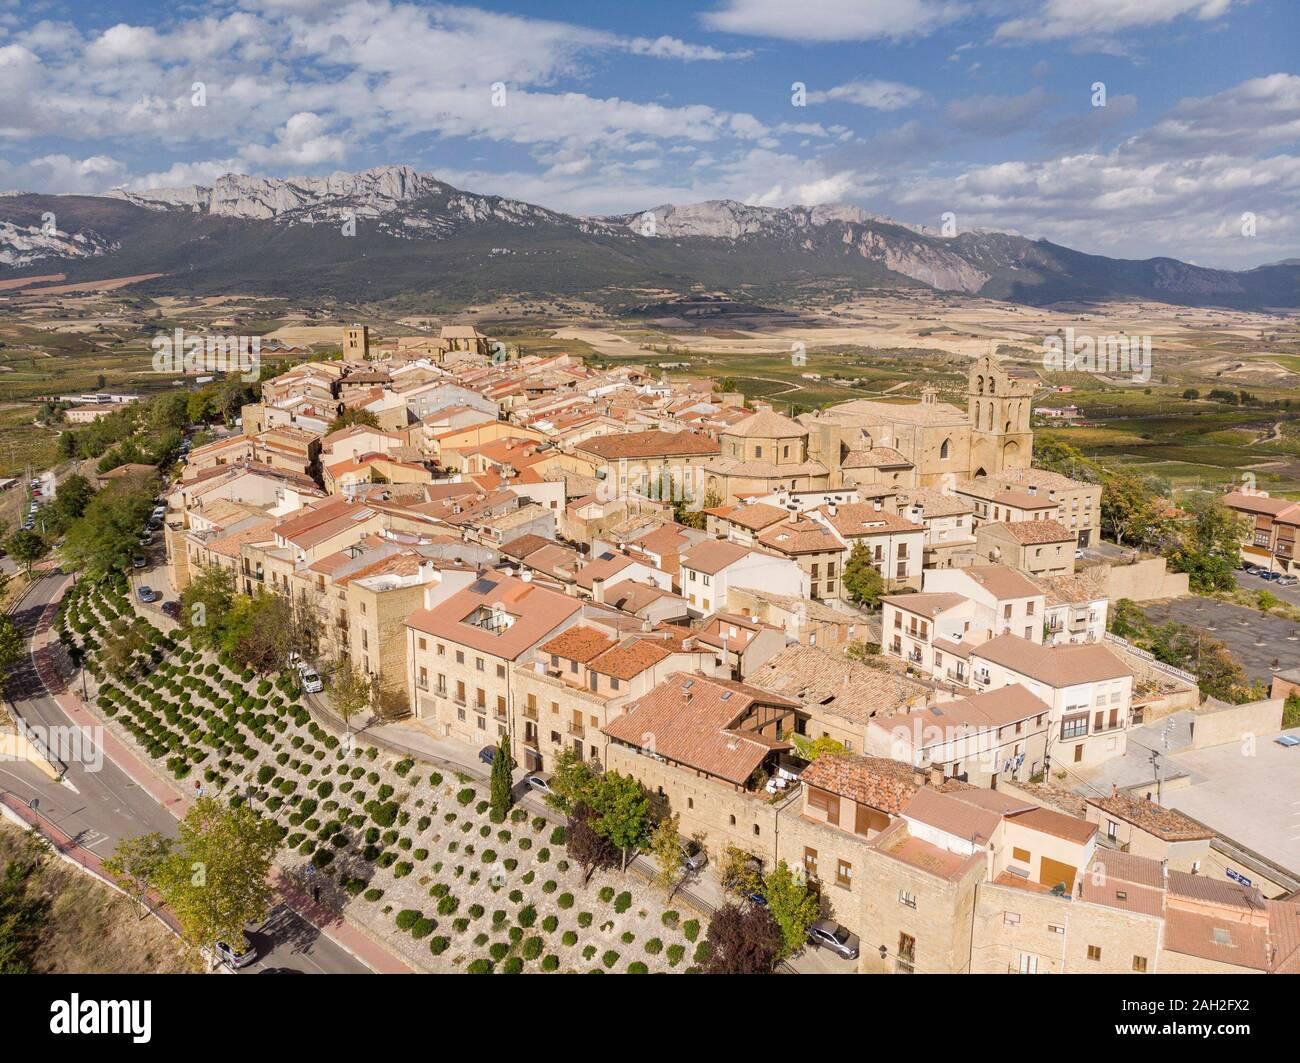 Pueblos de España que merecen ser visitados Laguardia-alava-pas-vasco-spain-2AH2FX2